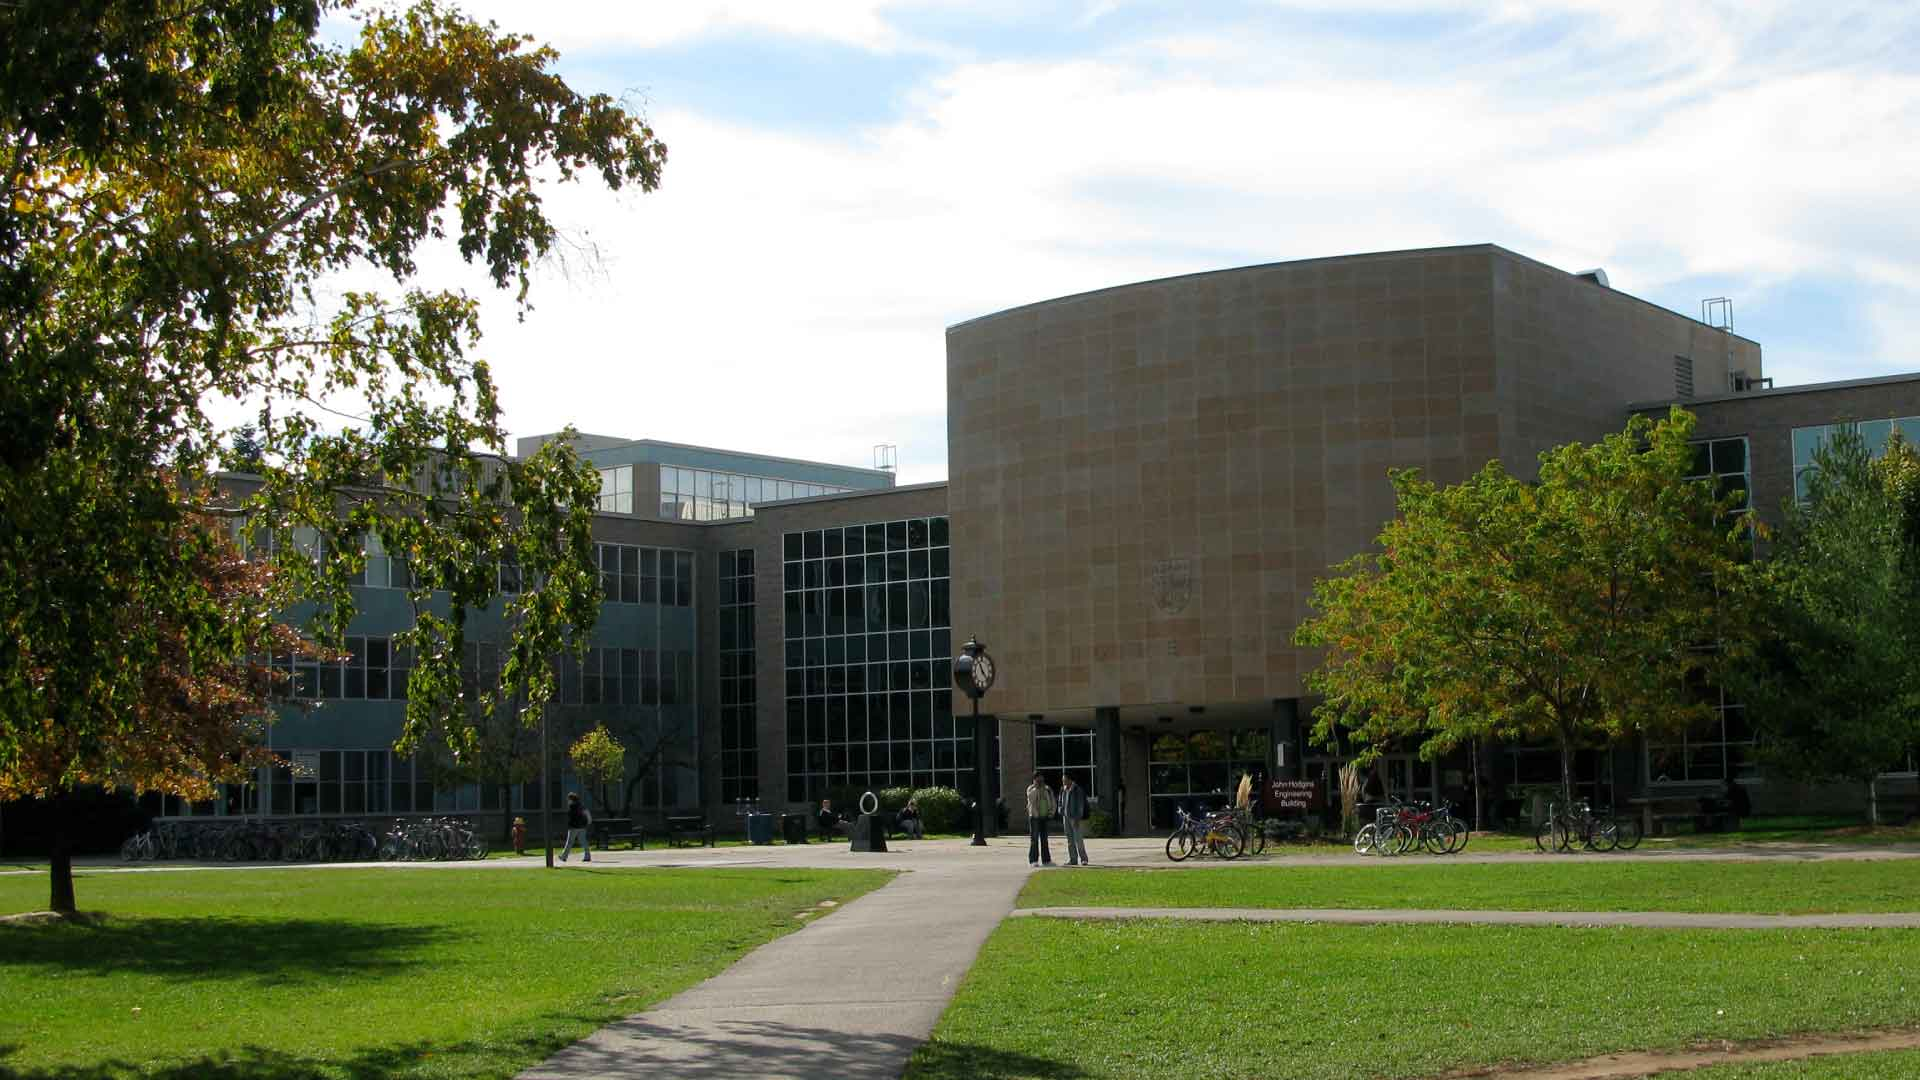 John Hodgins Building at McMaster University